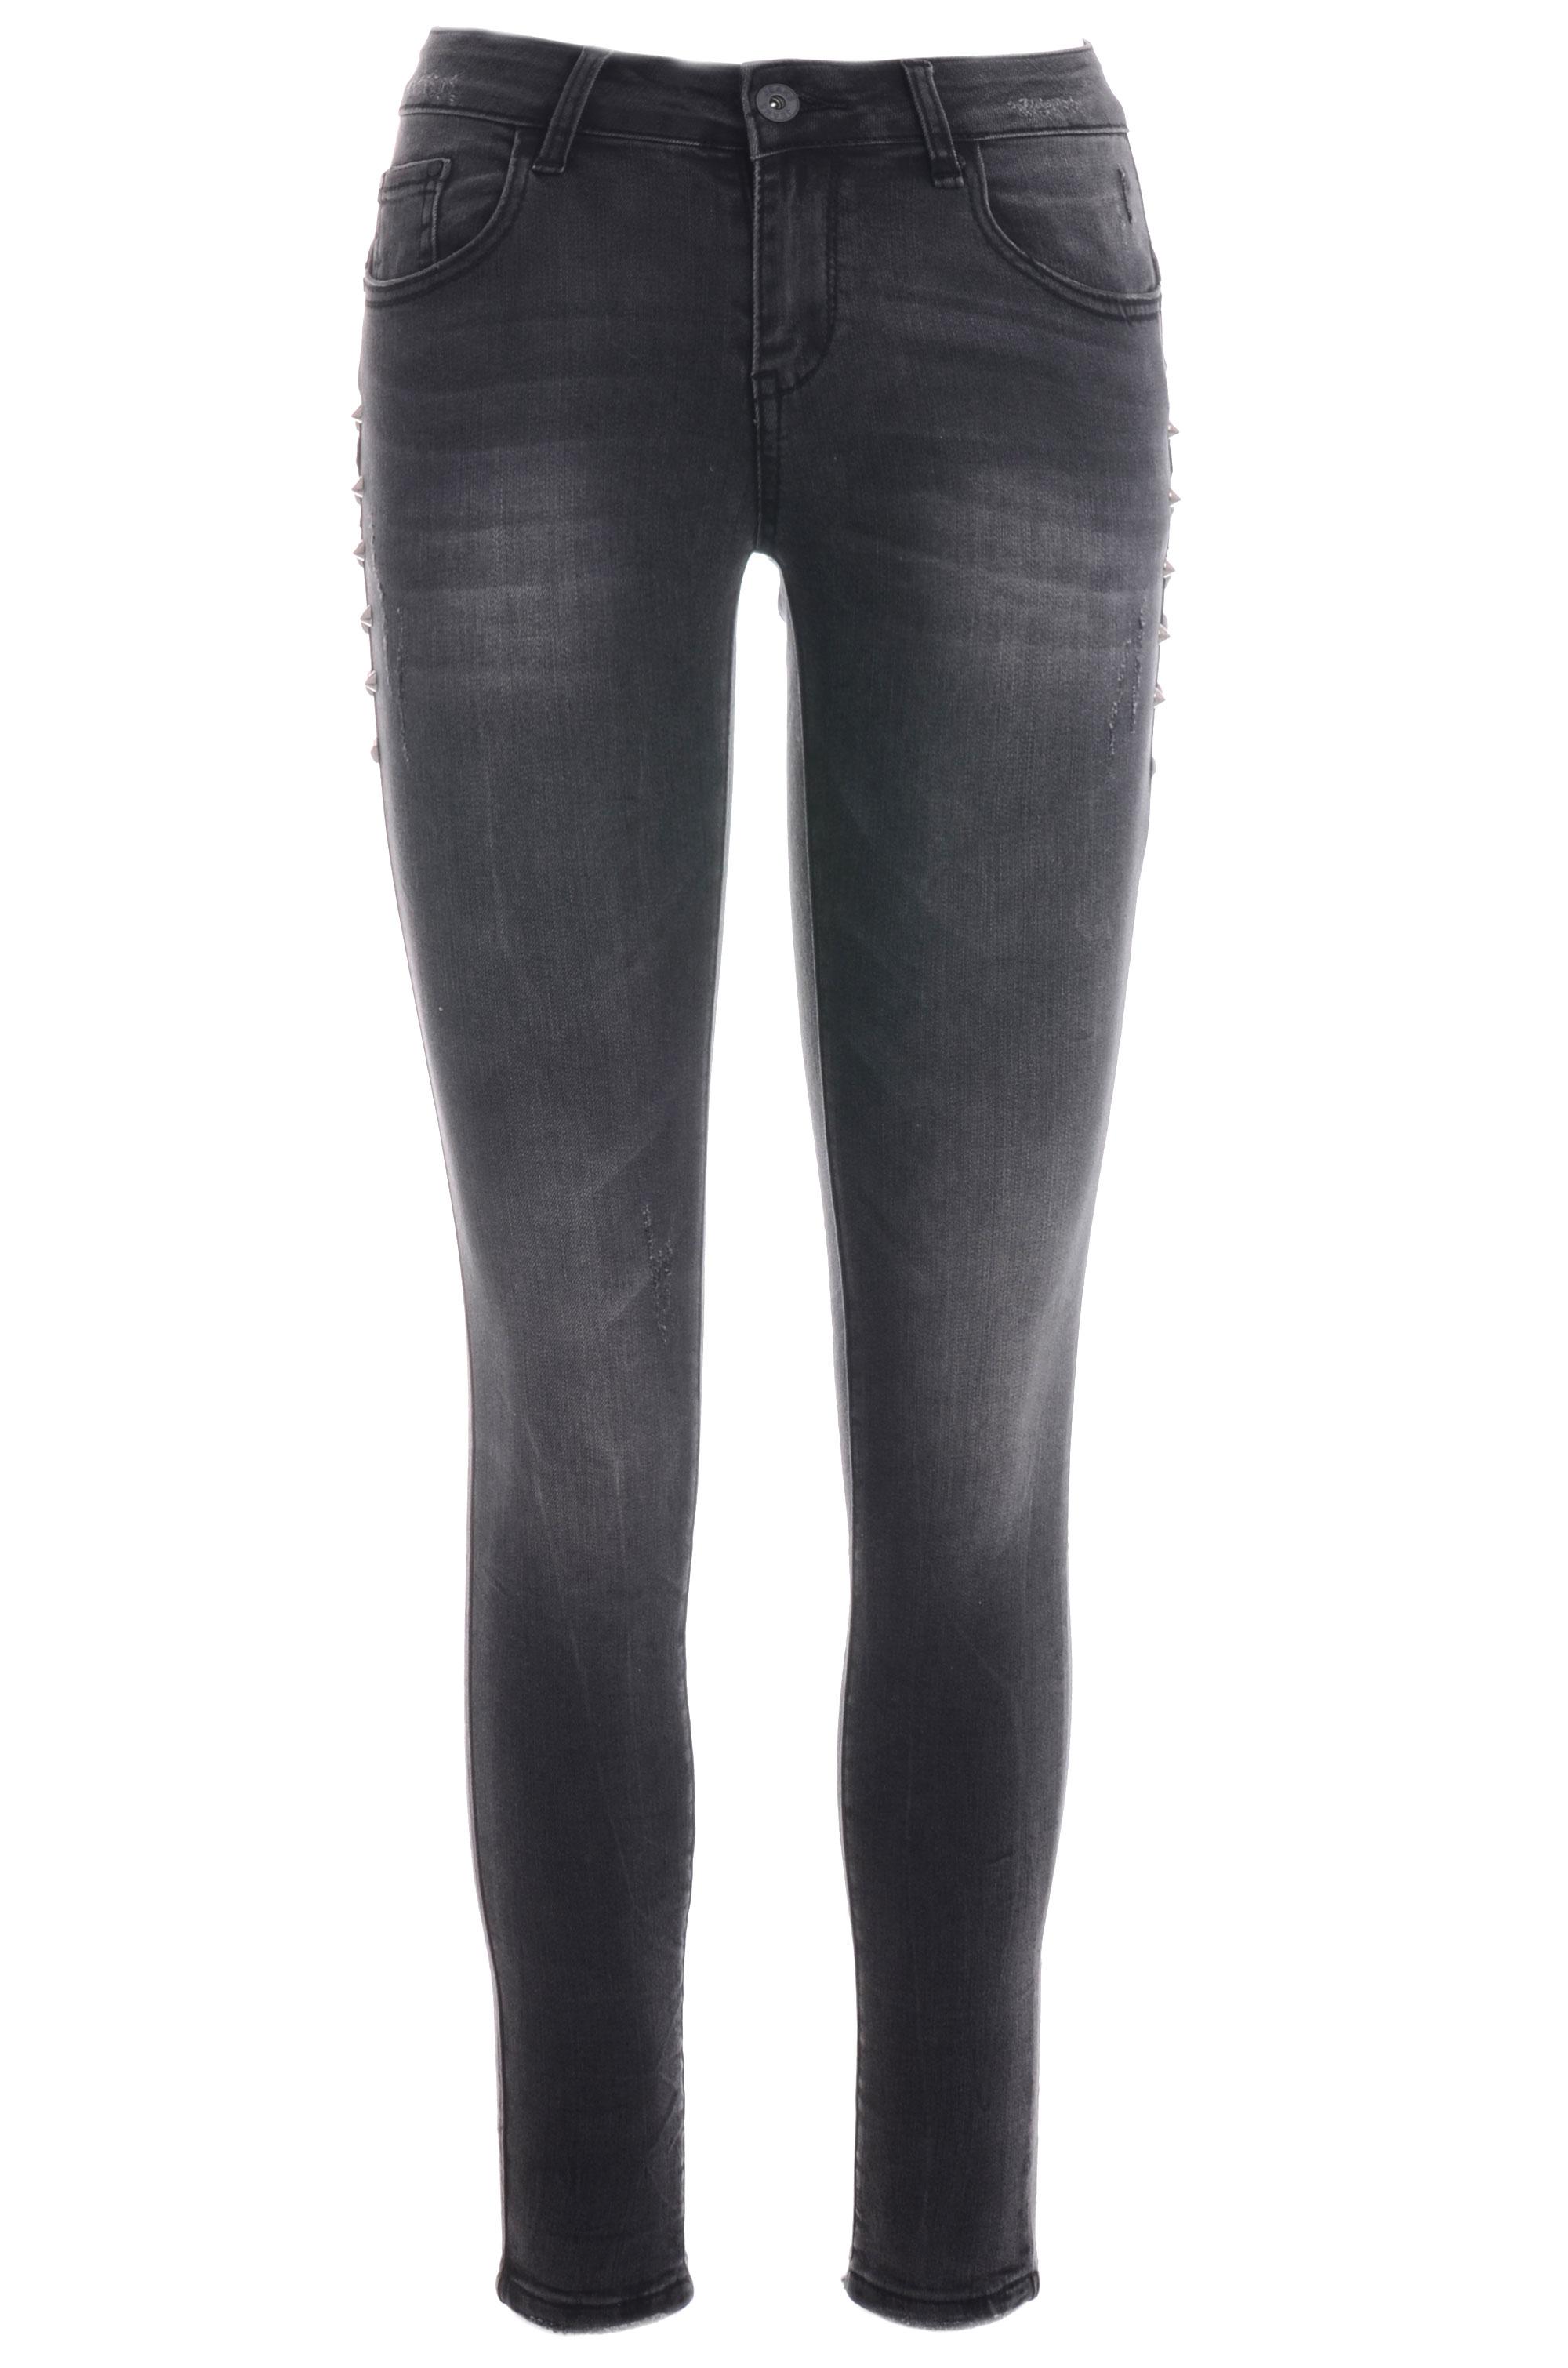 Spodnie - 42-6107 NERO - Unisono